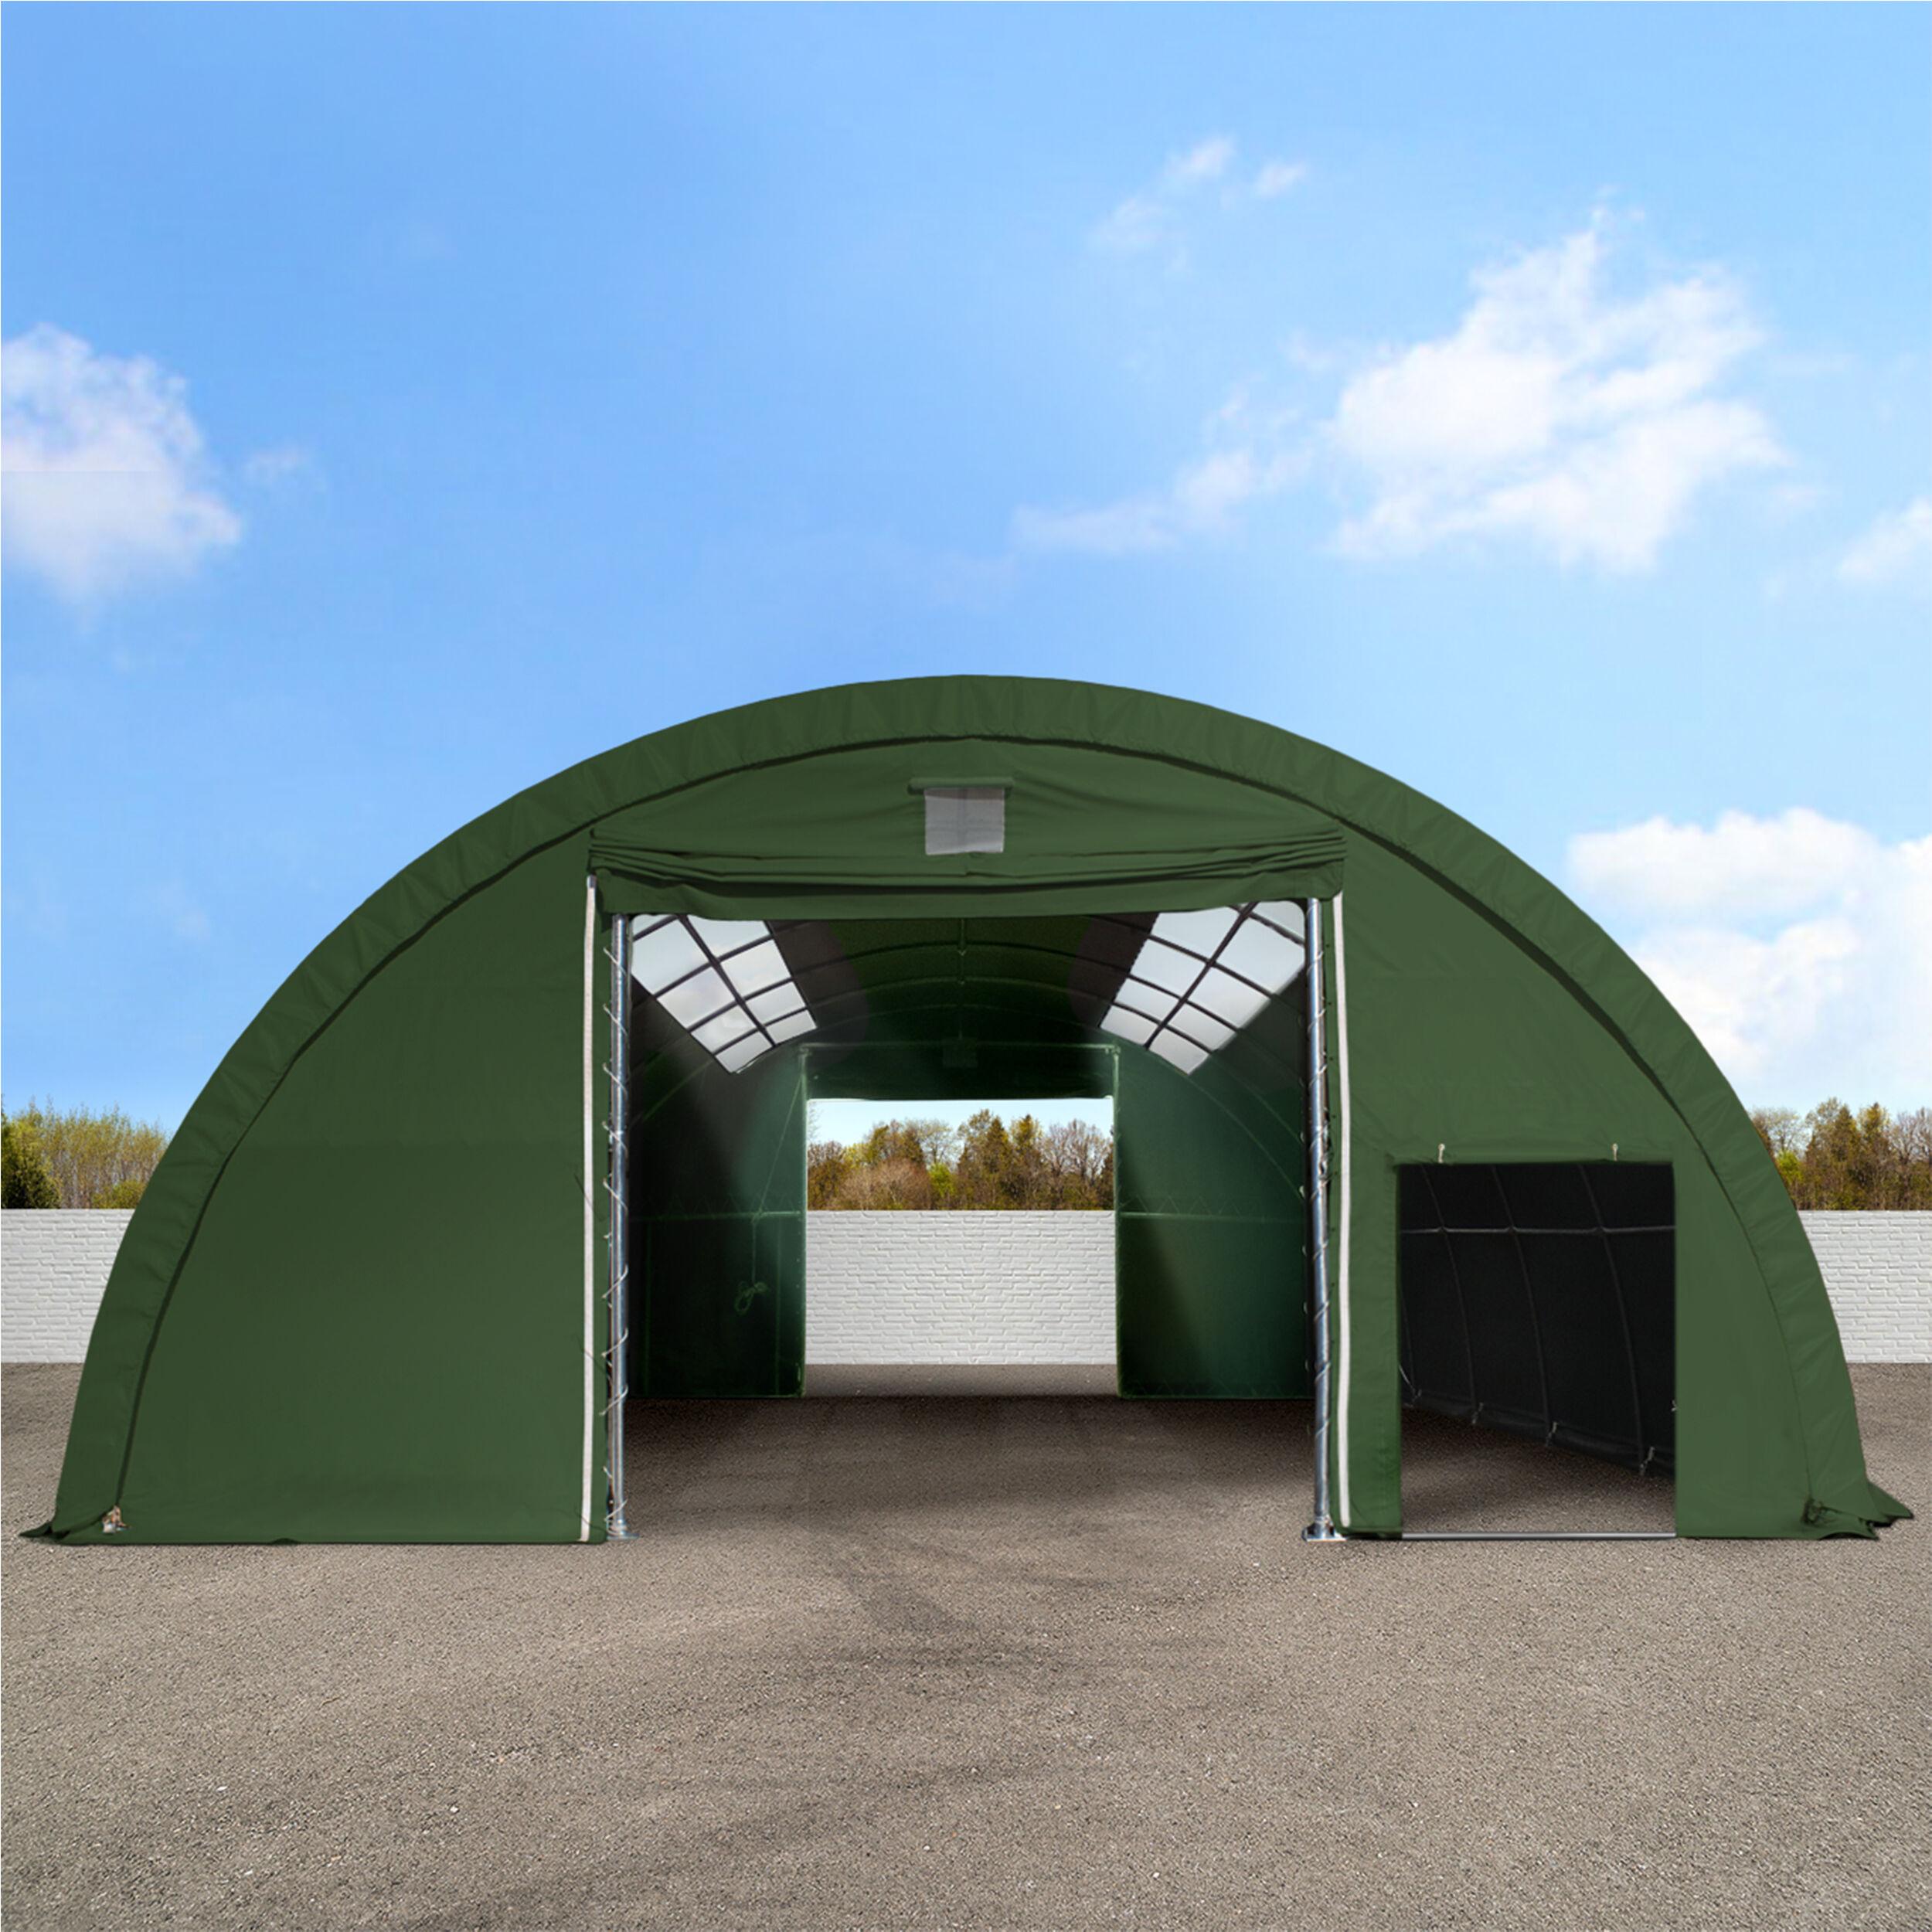 Intent24.fr Tunnel de stockage 9,15x12m PVC 720 g/m2 vert imperméable tunnel agricole